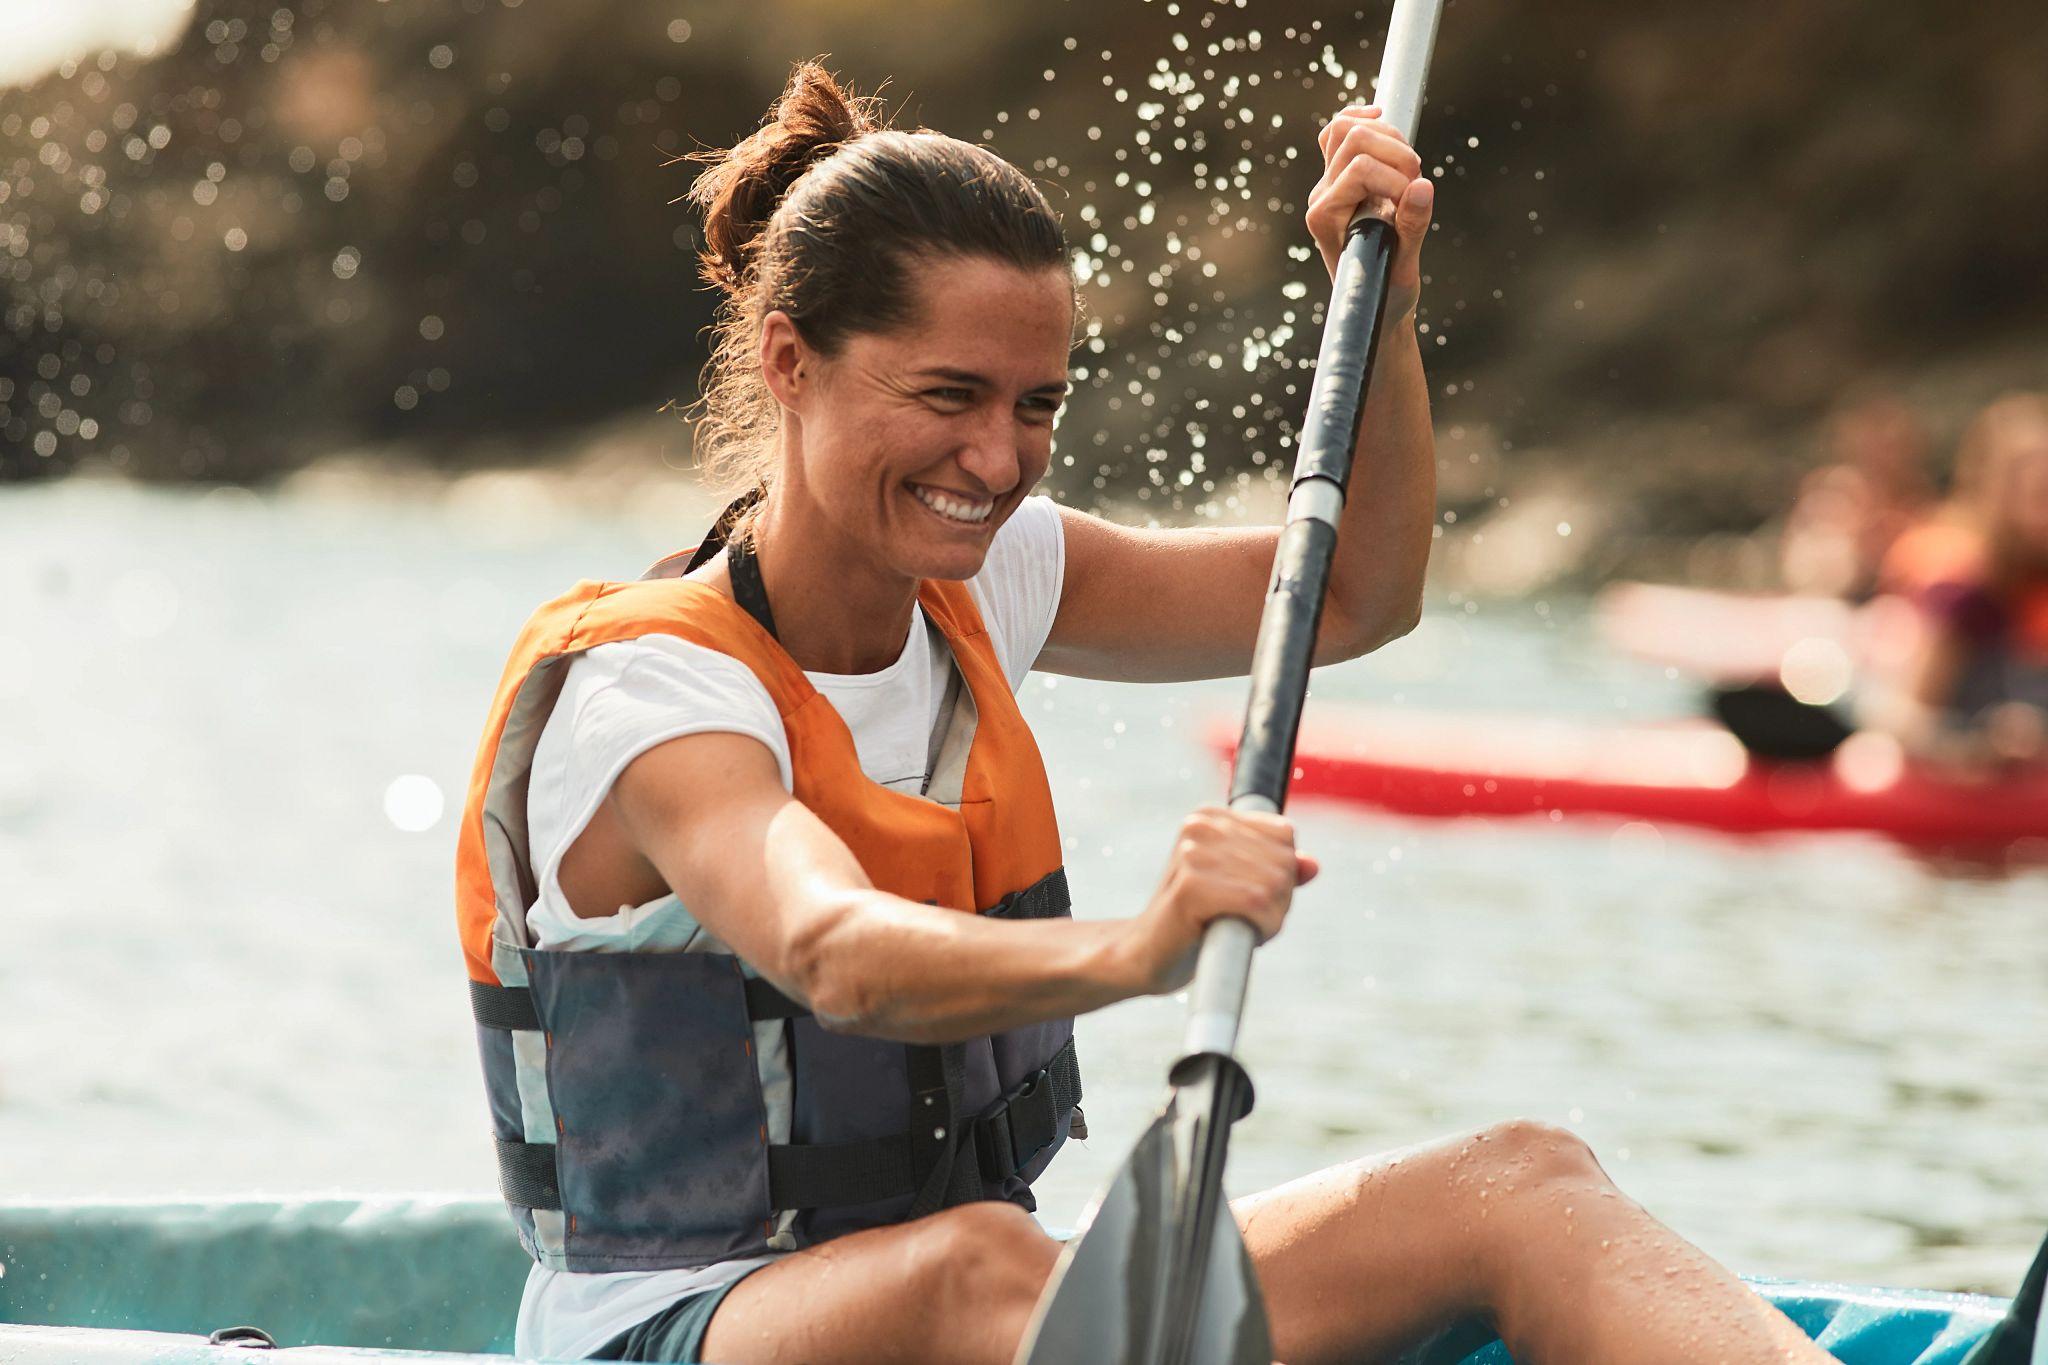 An image of a woman kayaking.